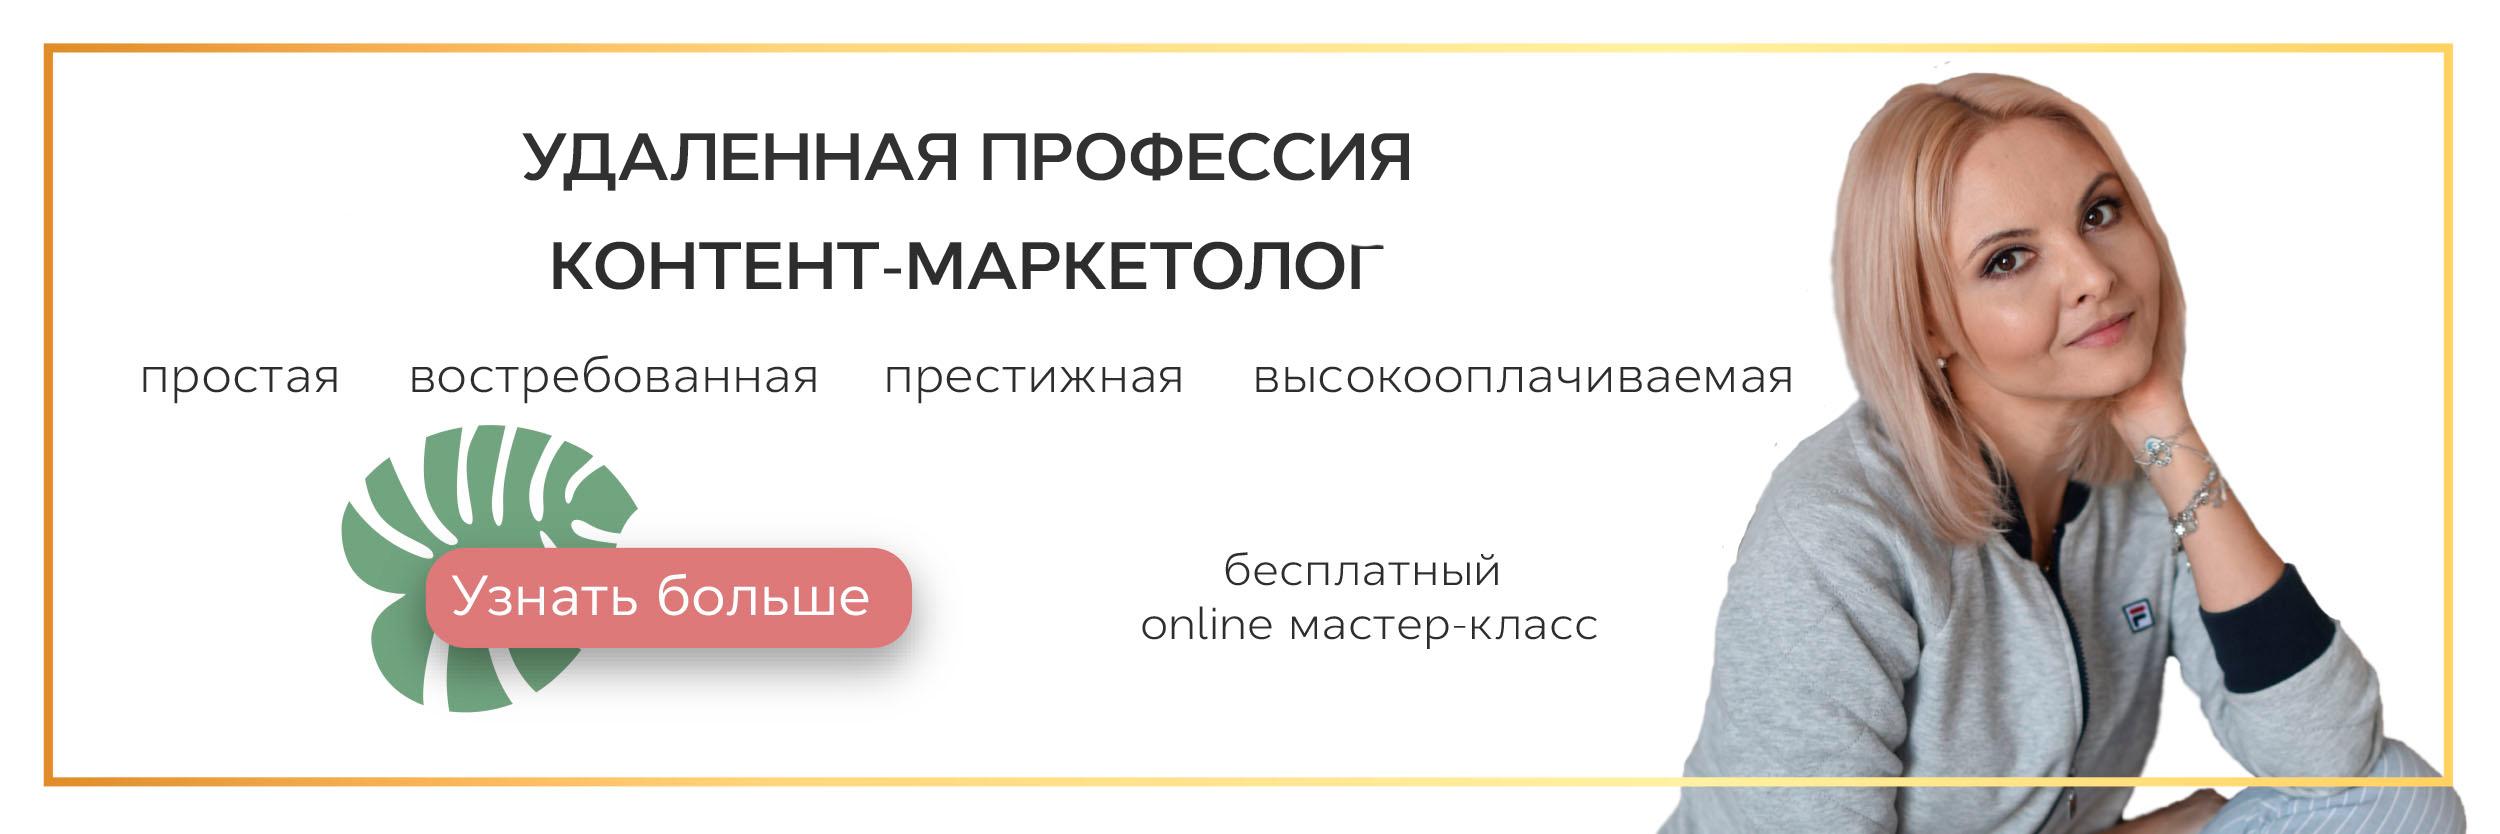 Онлайн курсы контент-маргетолог